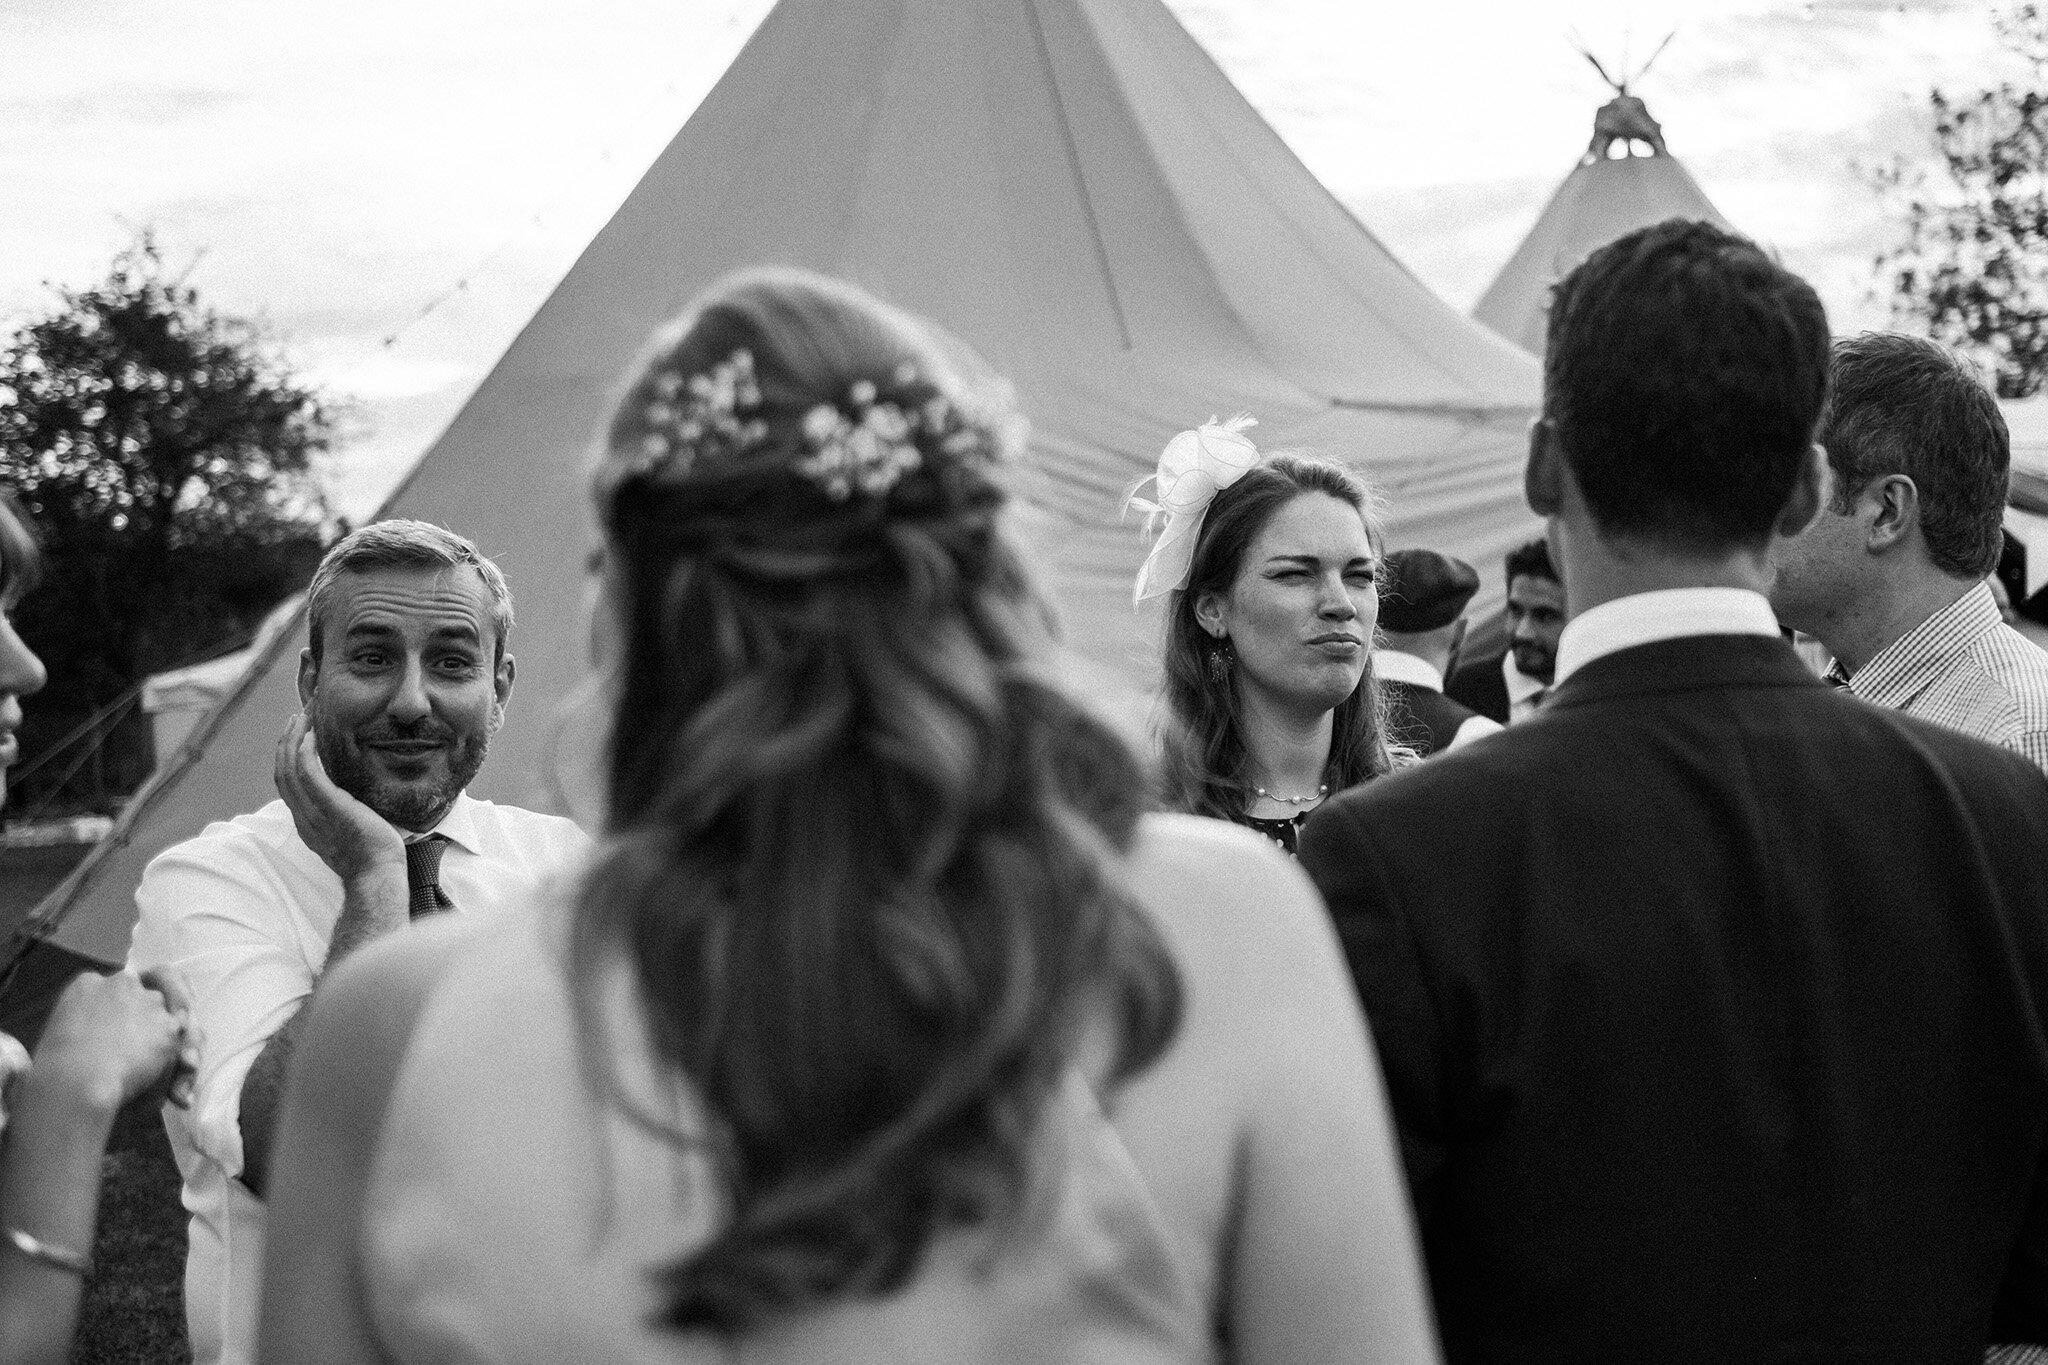 scott-stockwell-photography-wedding-photographer-squint-black-white.jpg